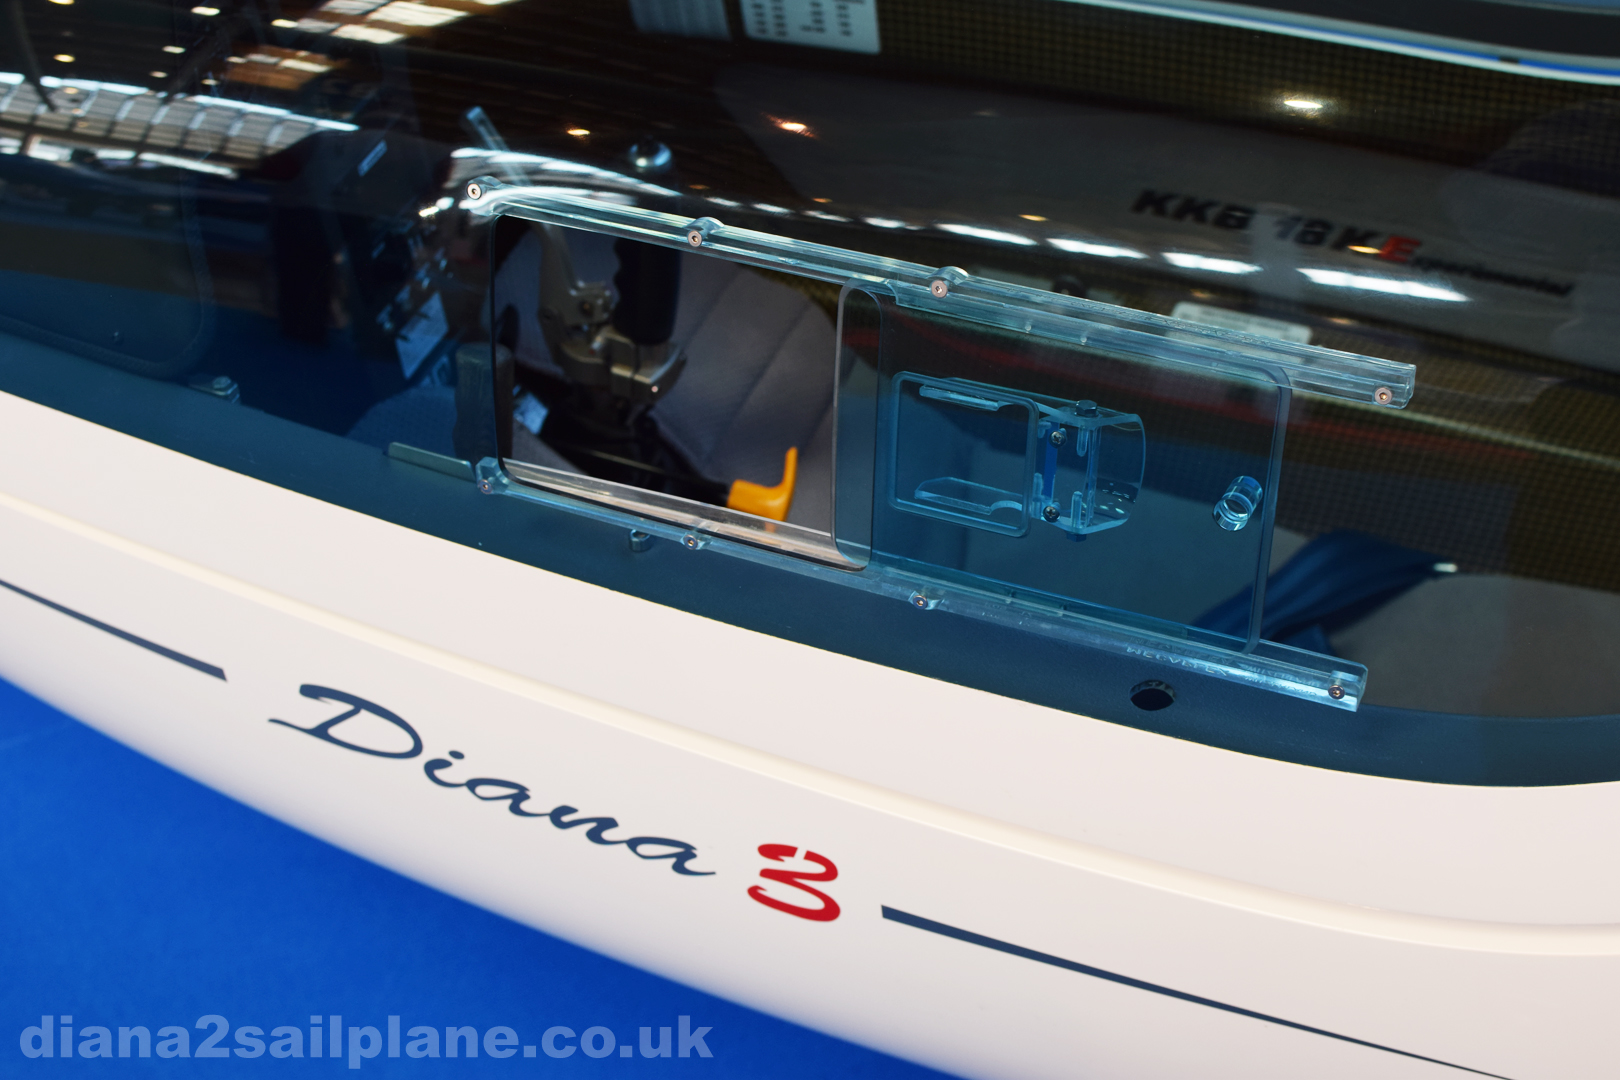 Diana 3